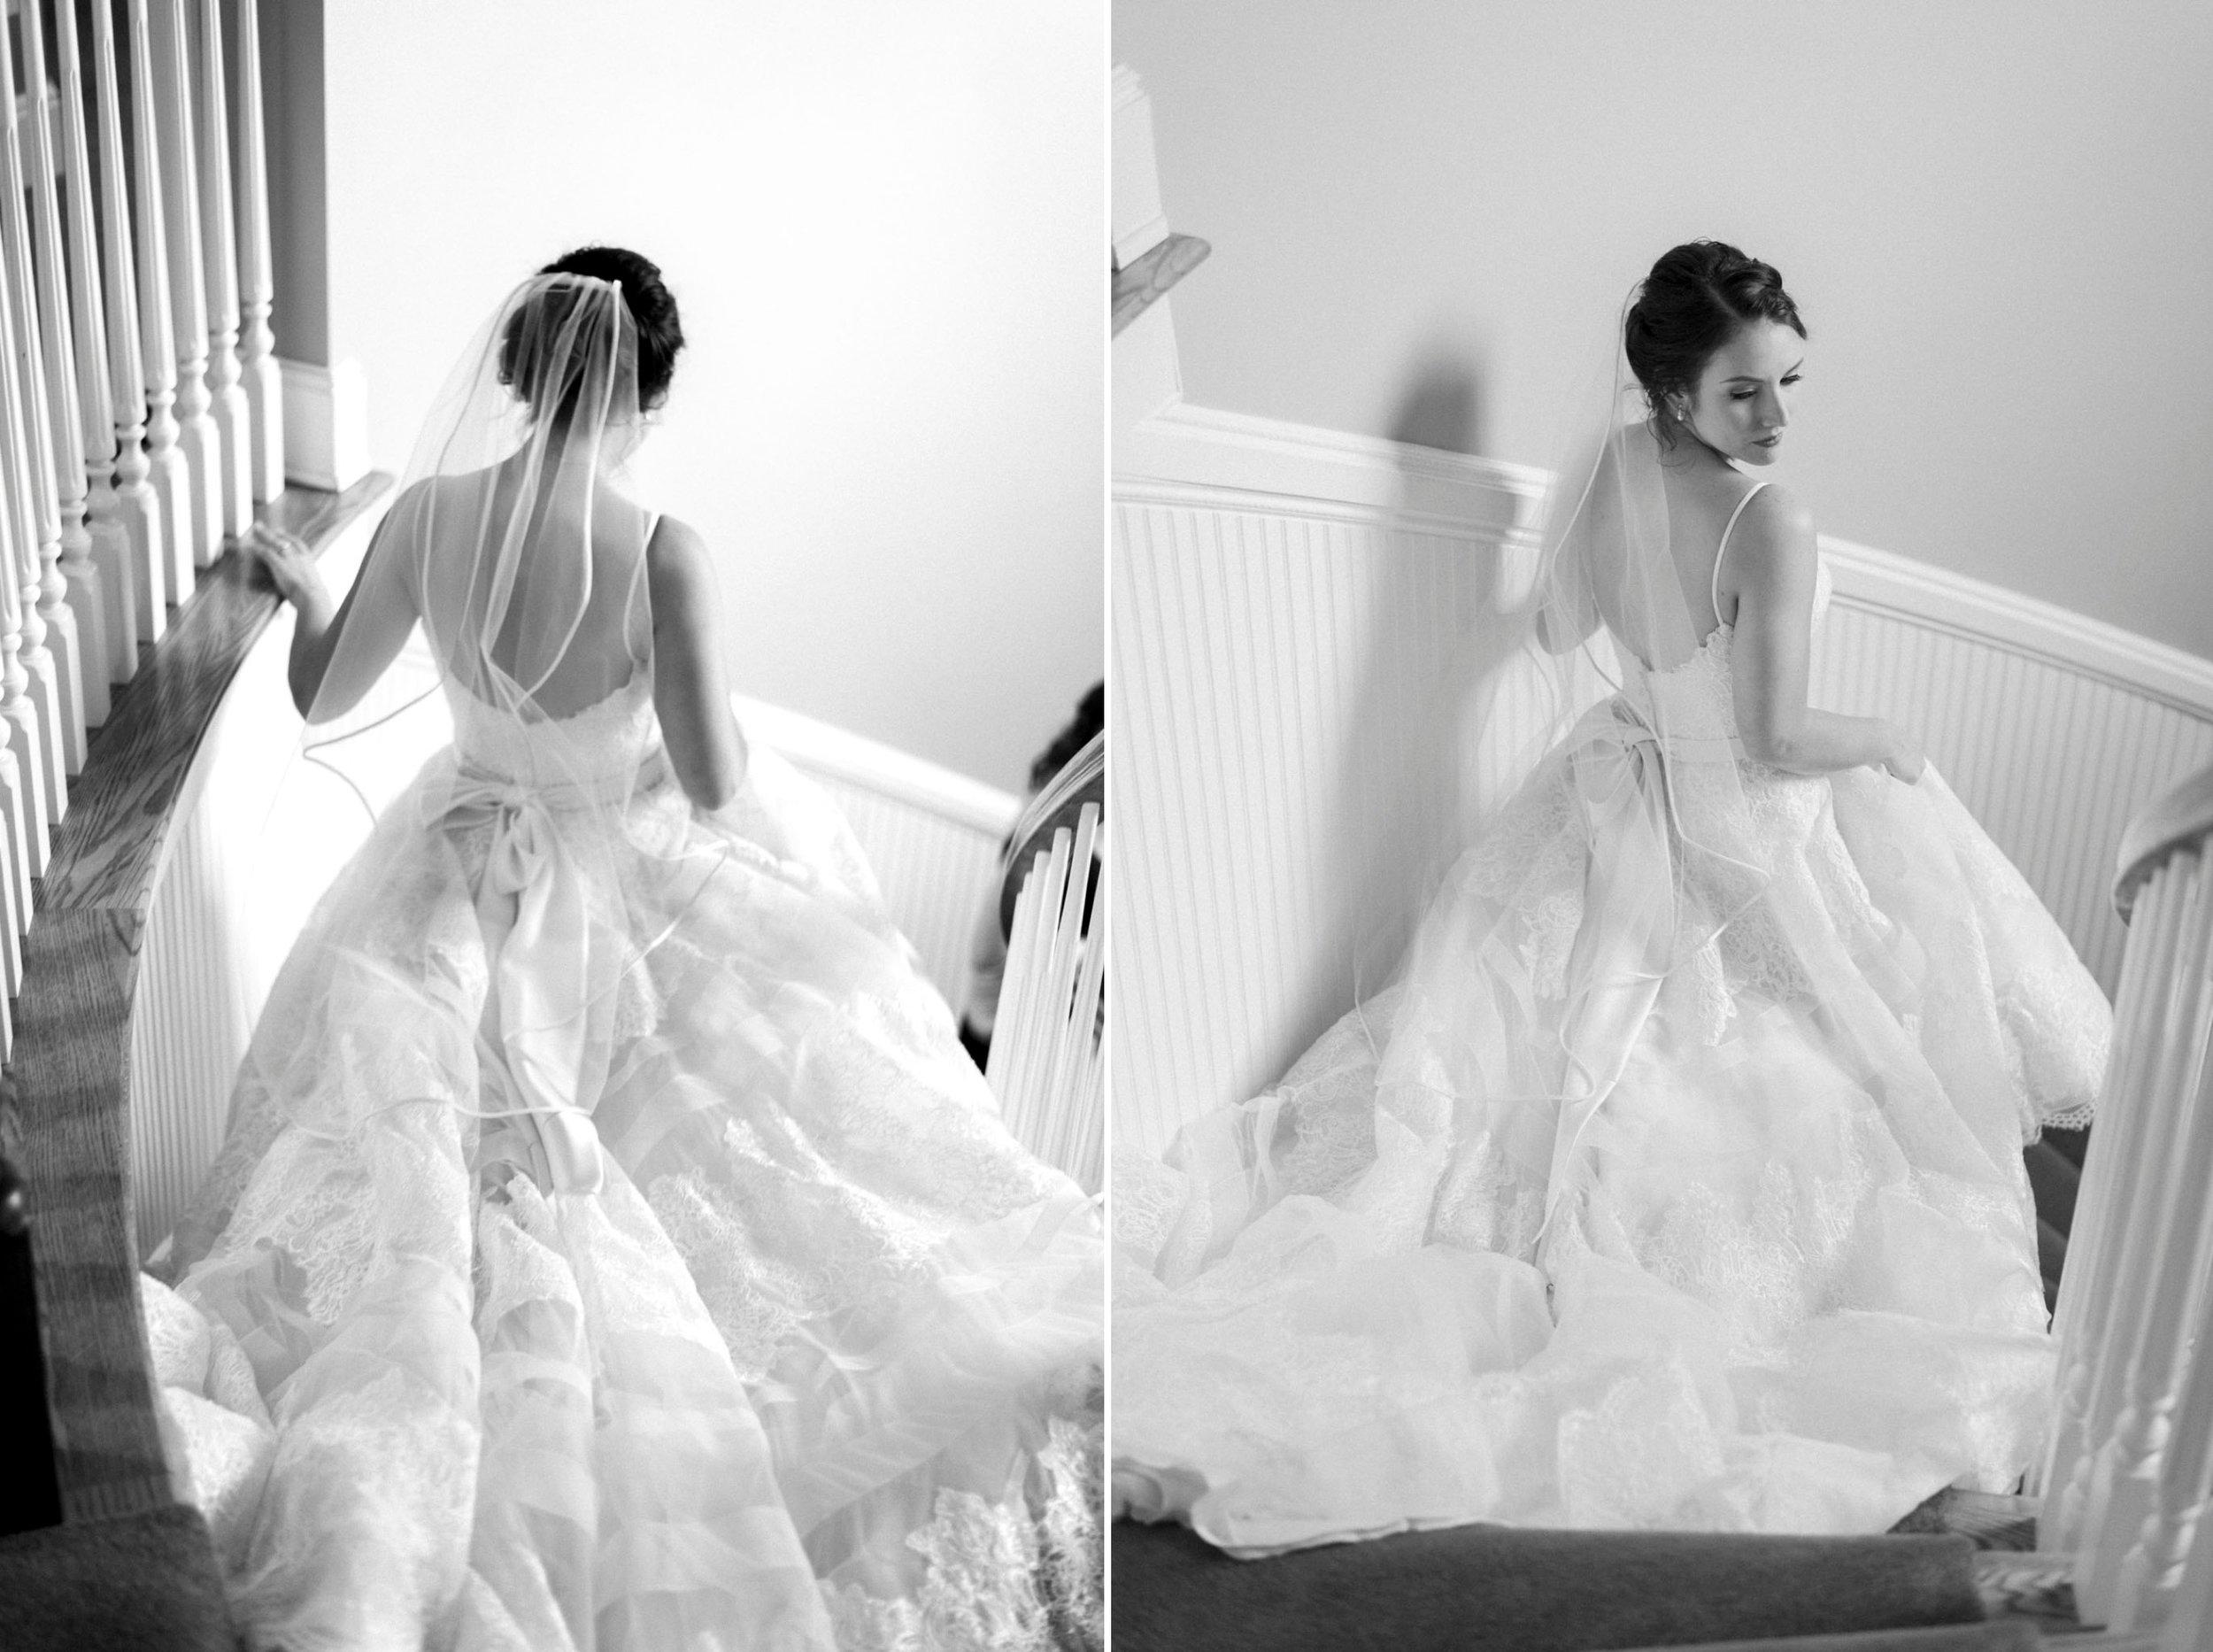 IrvineEstate_LexingtonVA_Wedding_FallWedding_VirginiaWeddingPhotographer 36.jpg